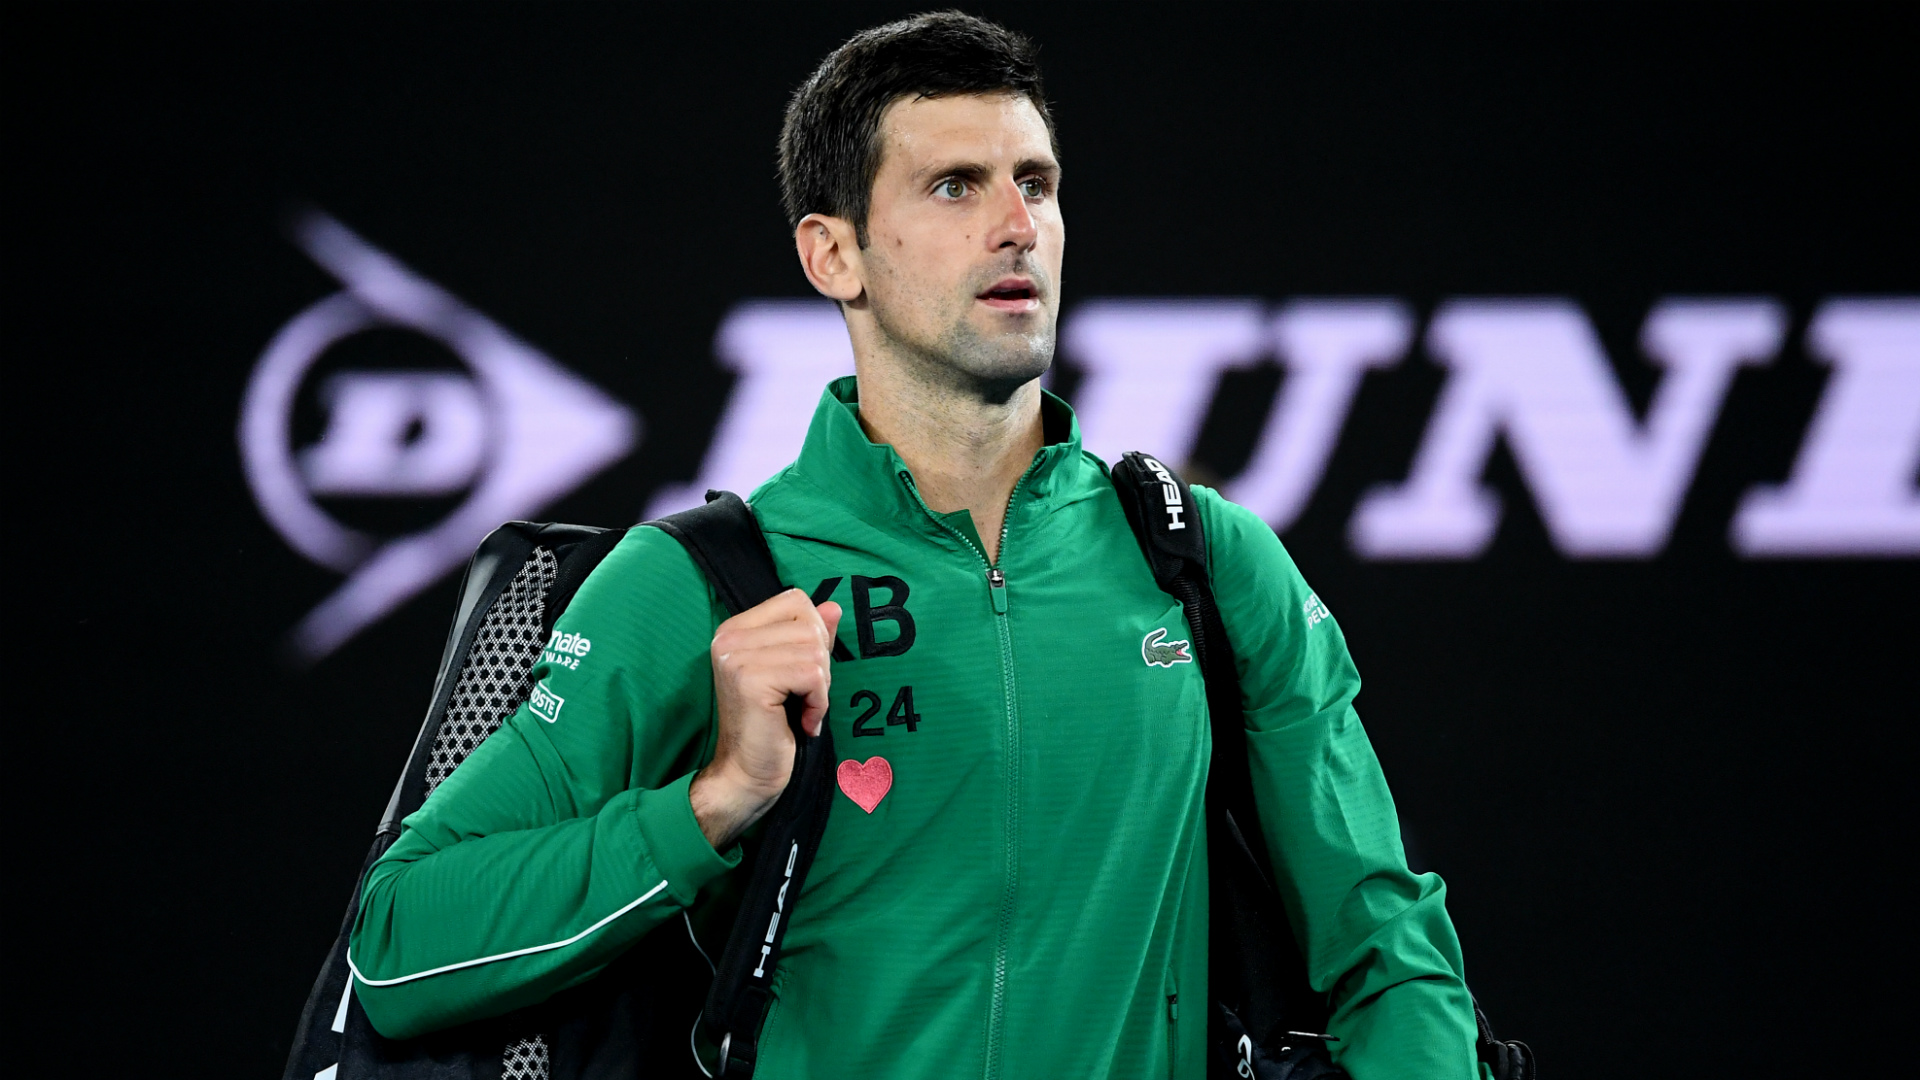 Novak Djokovic tests positive for coronavirus after organizing Adria Tour